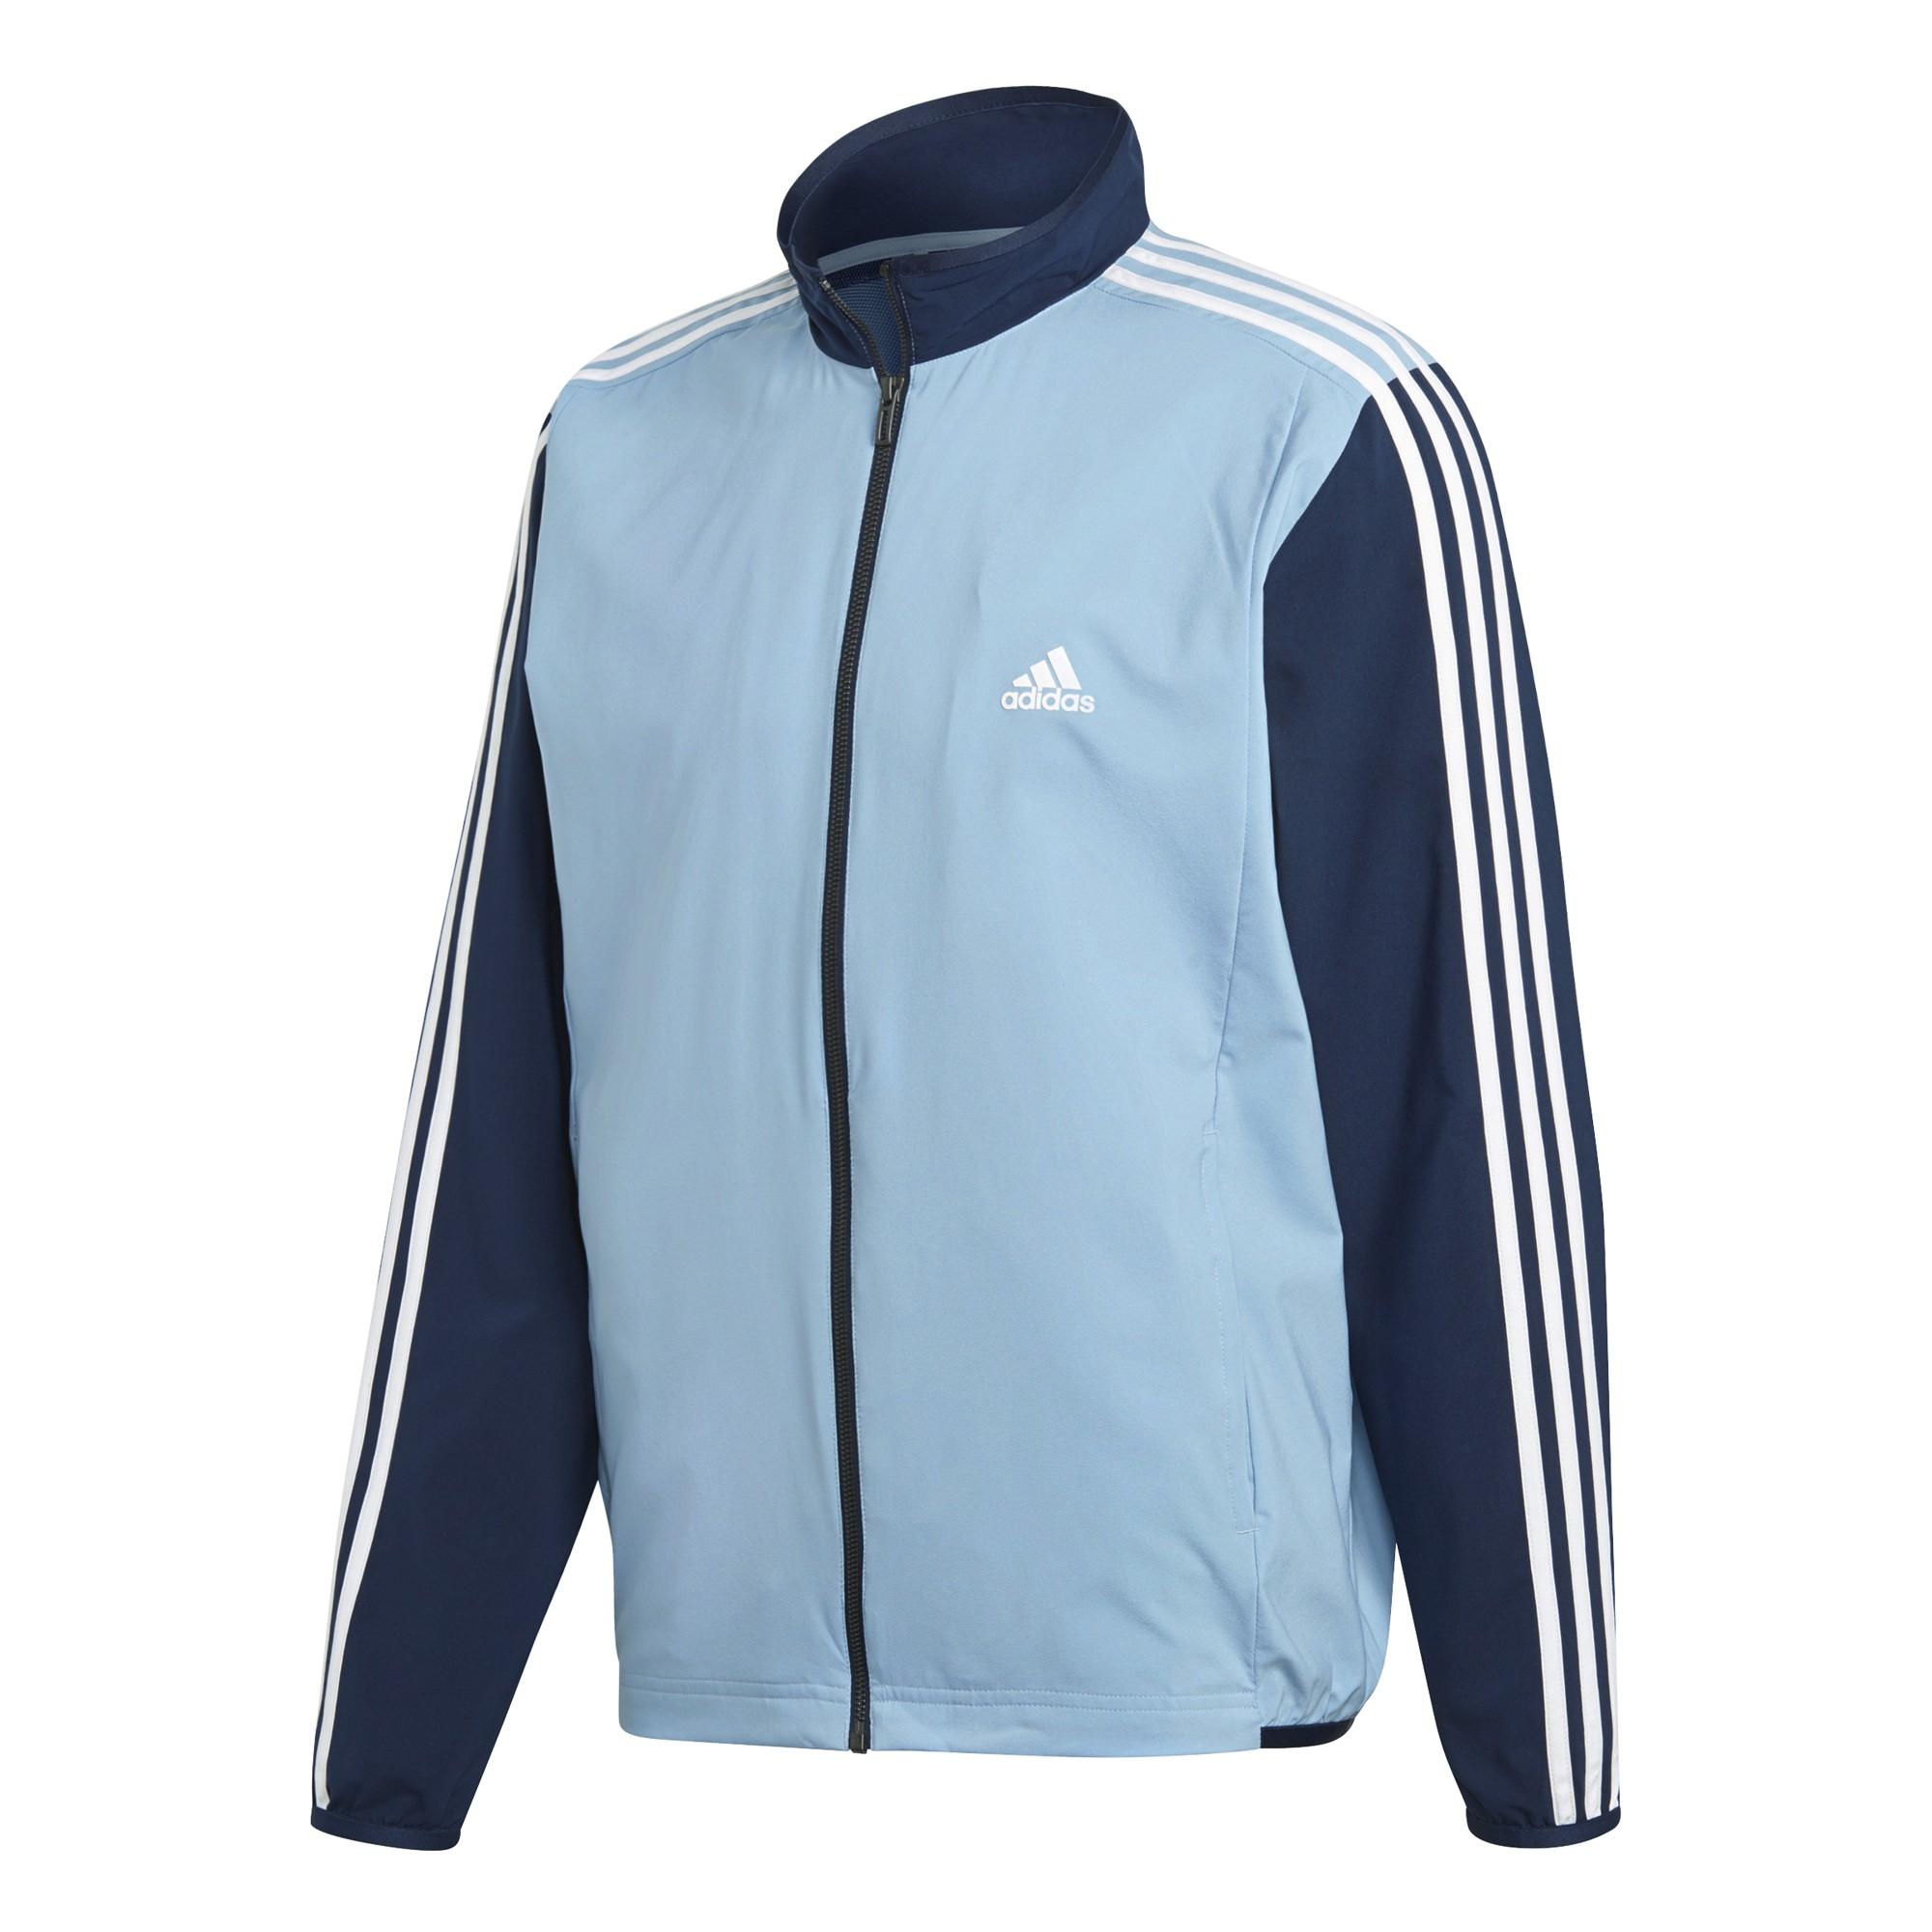 041ee5060 Chándal Adidas Wv Light Ts Marino Blanco Hombre - Deportes Moya